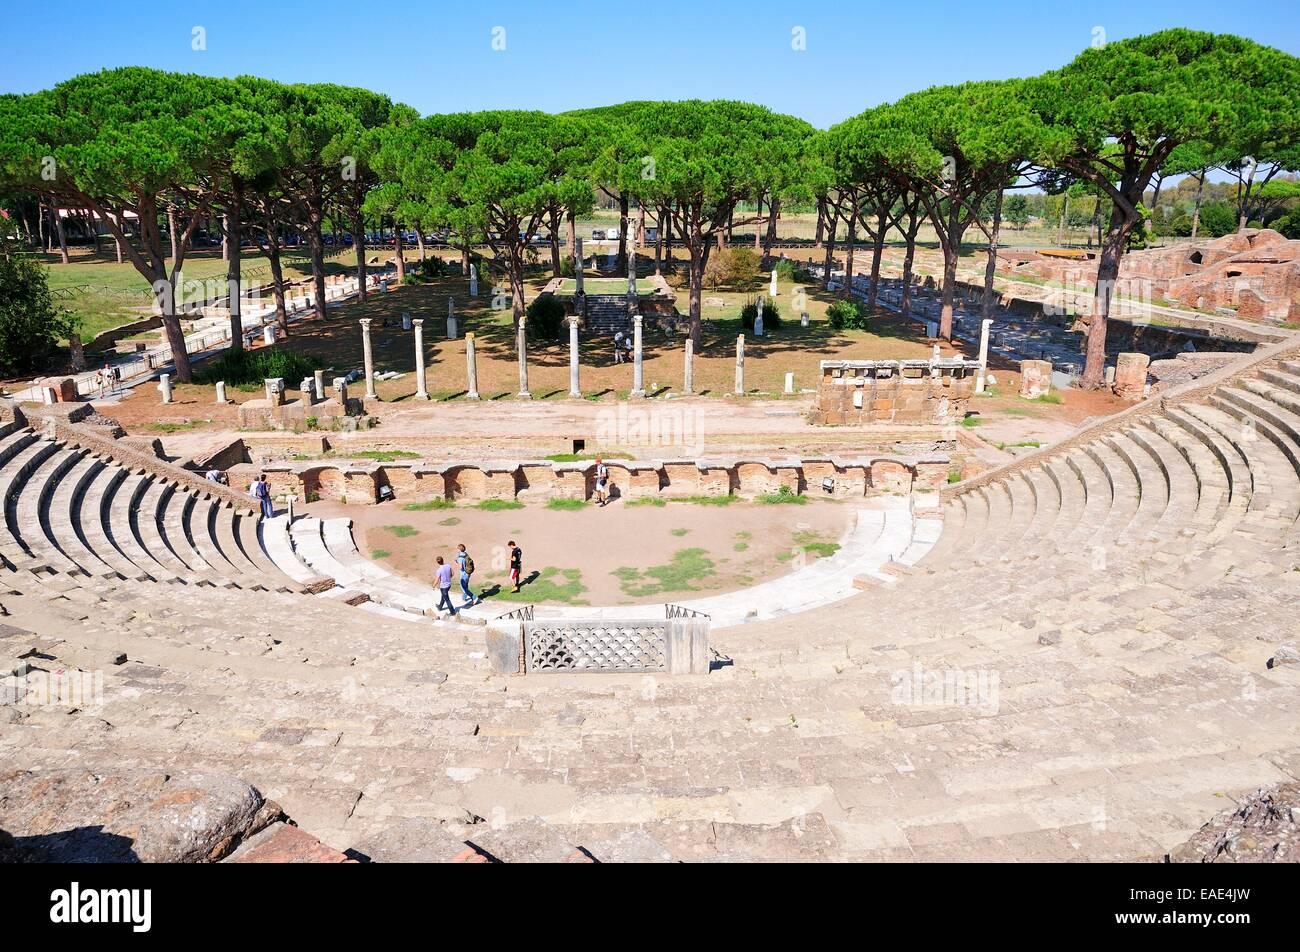 Roman Amphitheater, Ostia Antica, Rome, Lazio, Italy - Stock Image